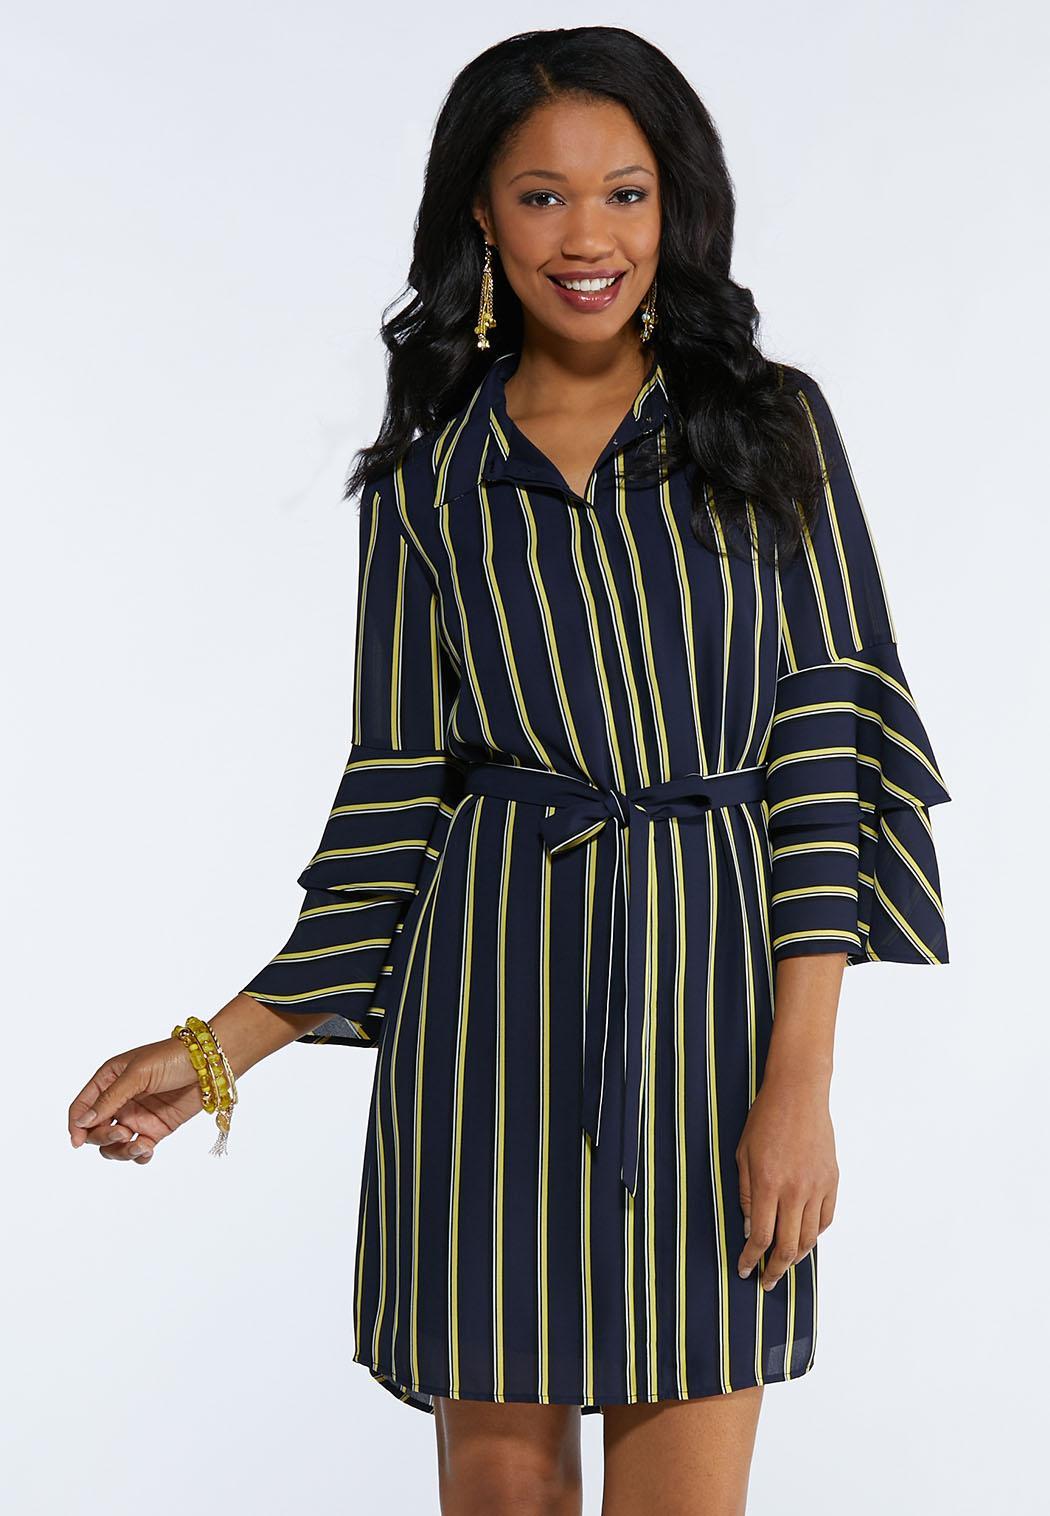 56f0100e2ed Stripe Bell Sleeve Shirt Dress Junior Misses Cato Fashions